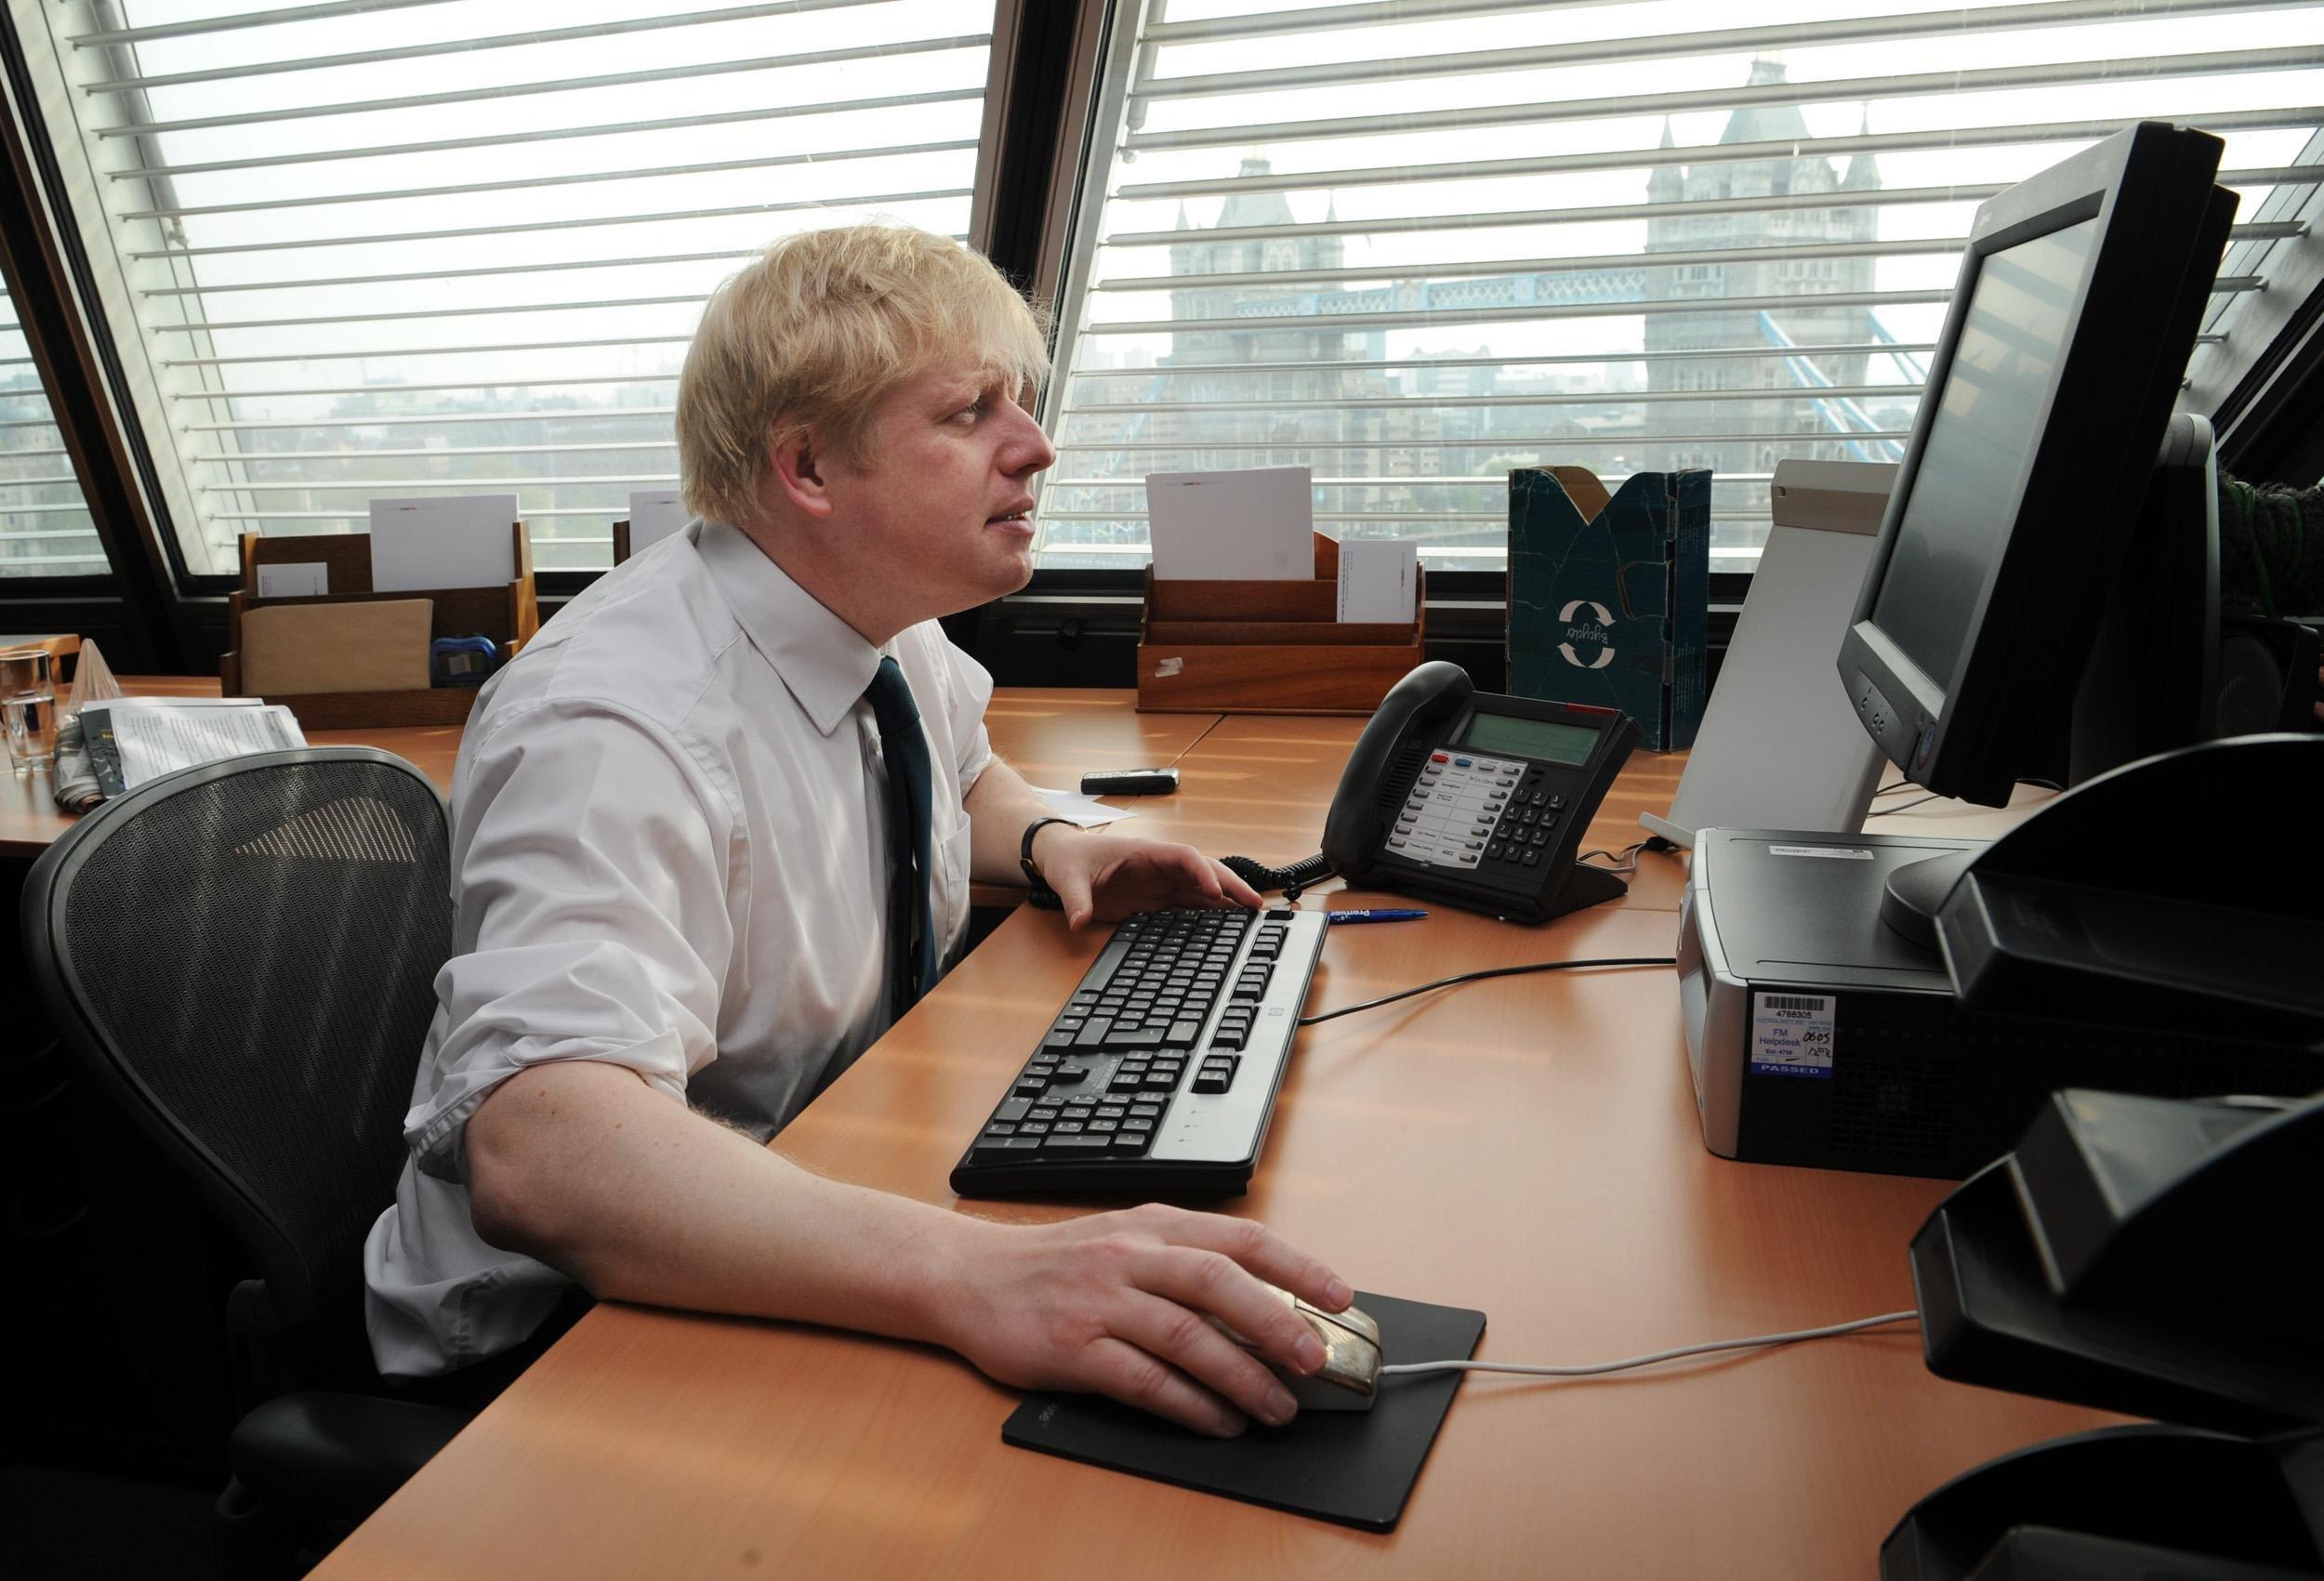 credit: PA. London Mayor Boris Johnson in his office at City Hall in London.